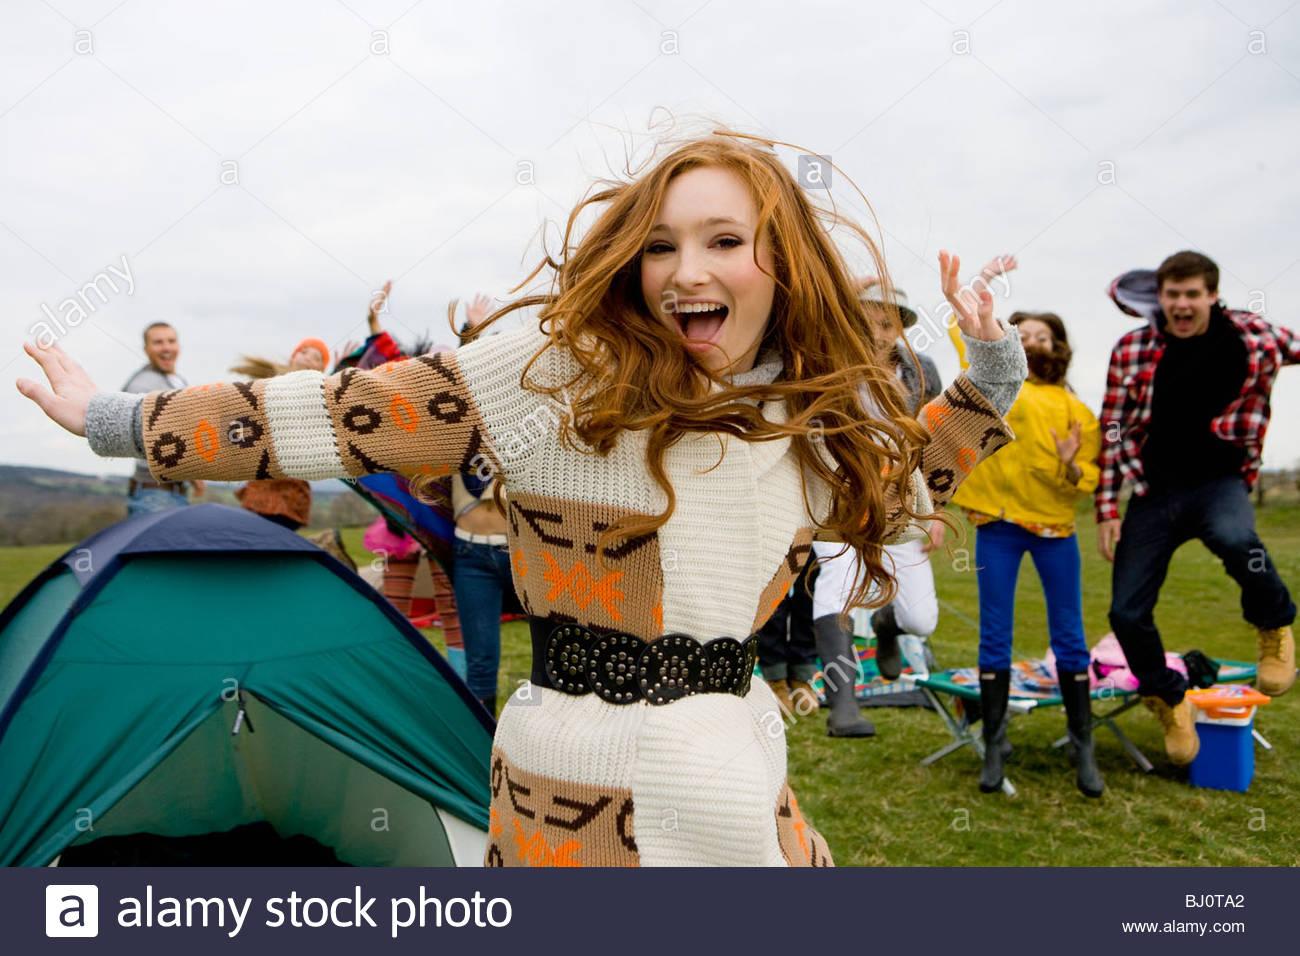 Camping und Outdoor-Festival besuchen begeistert Freunde Stockbild